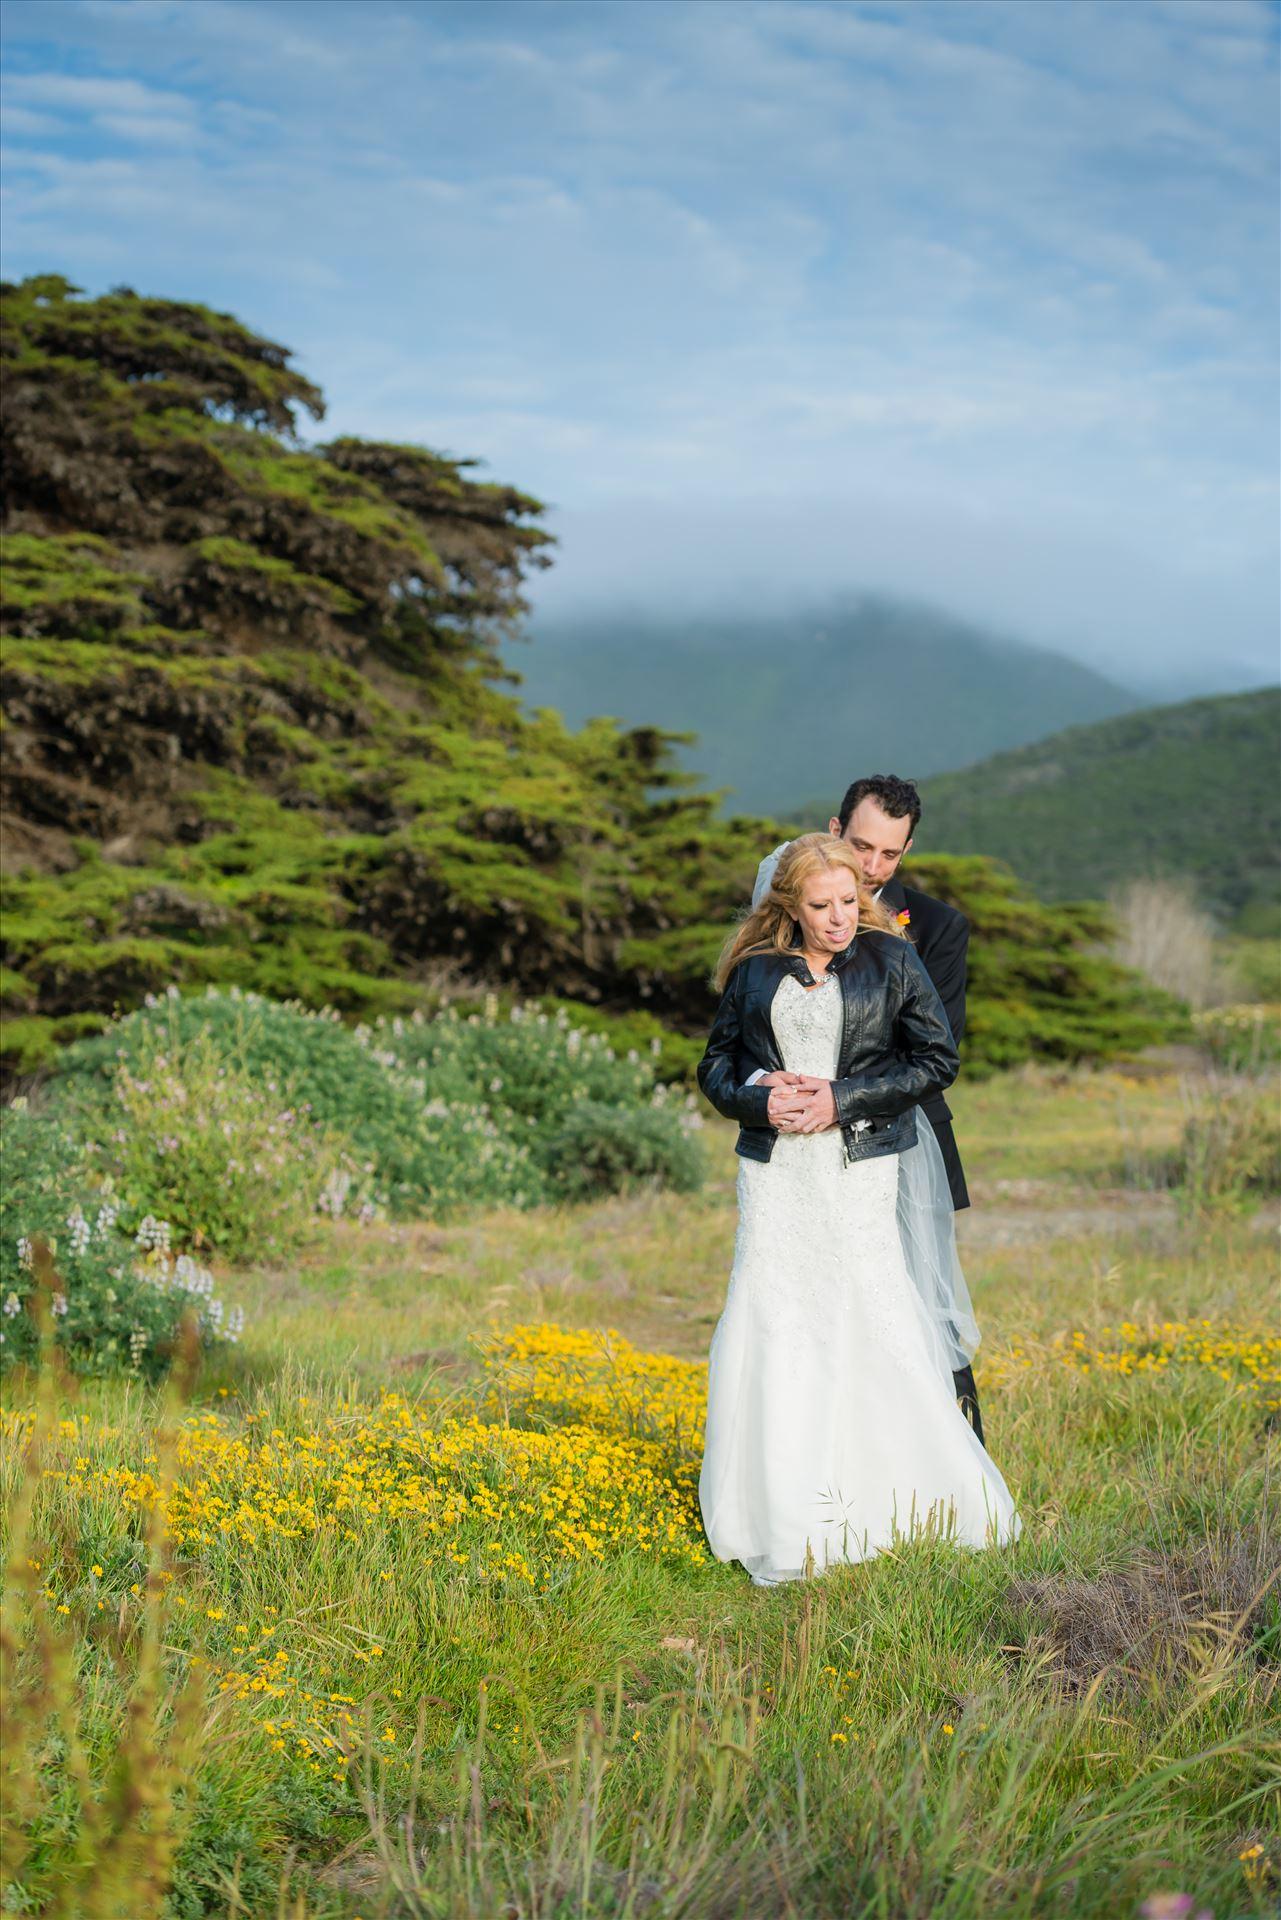 Adele and Jason 14  by Sarah Williams